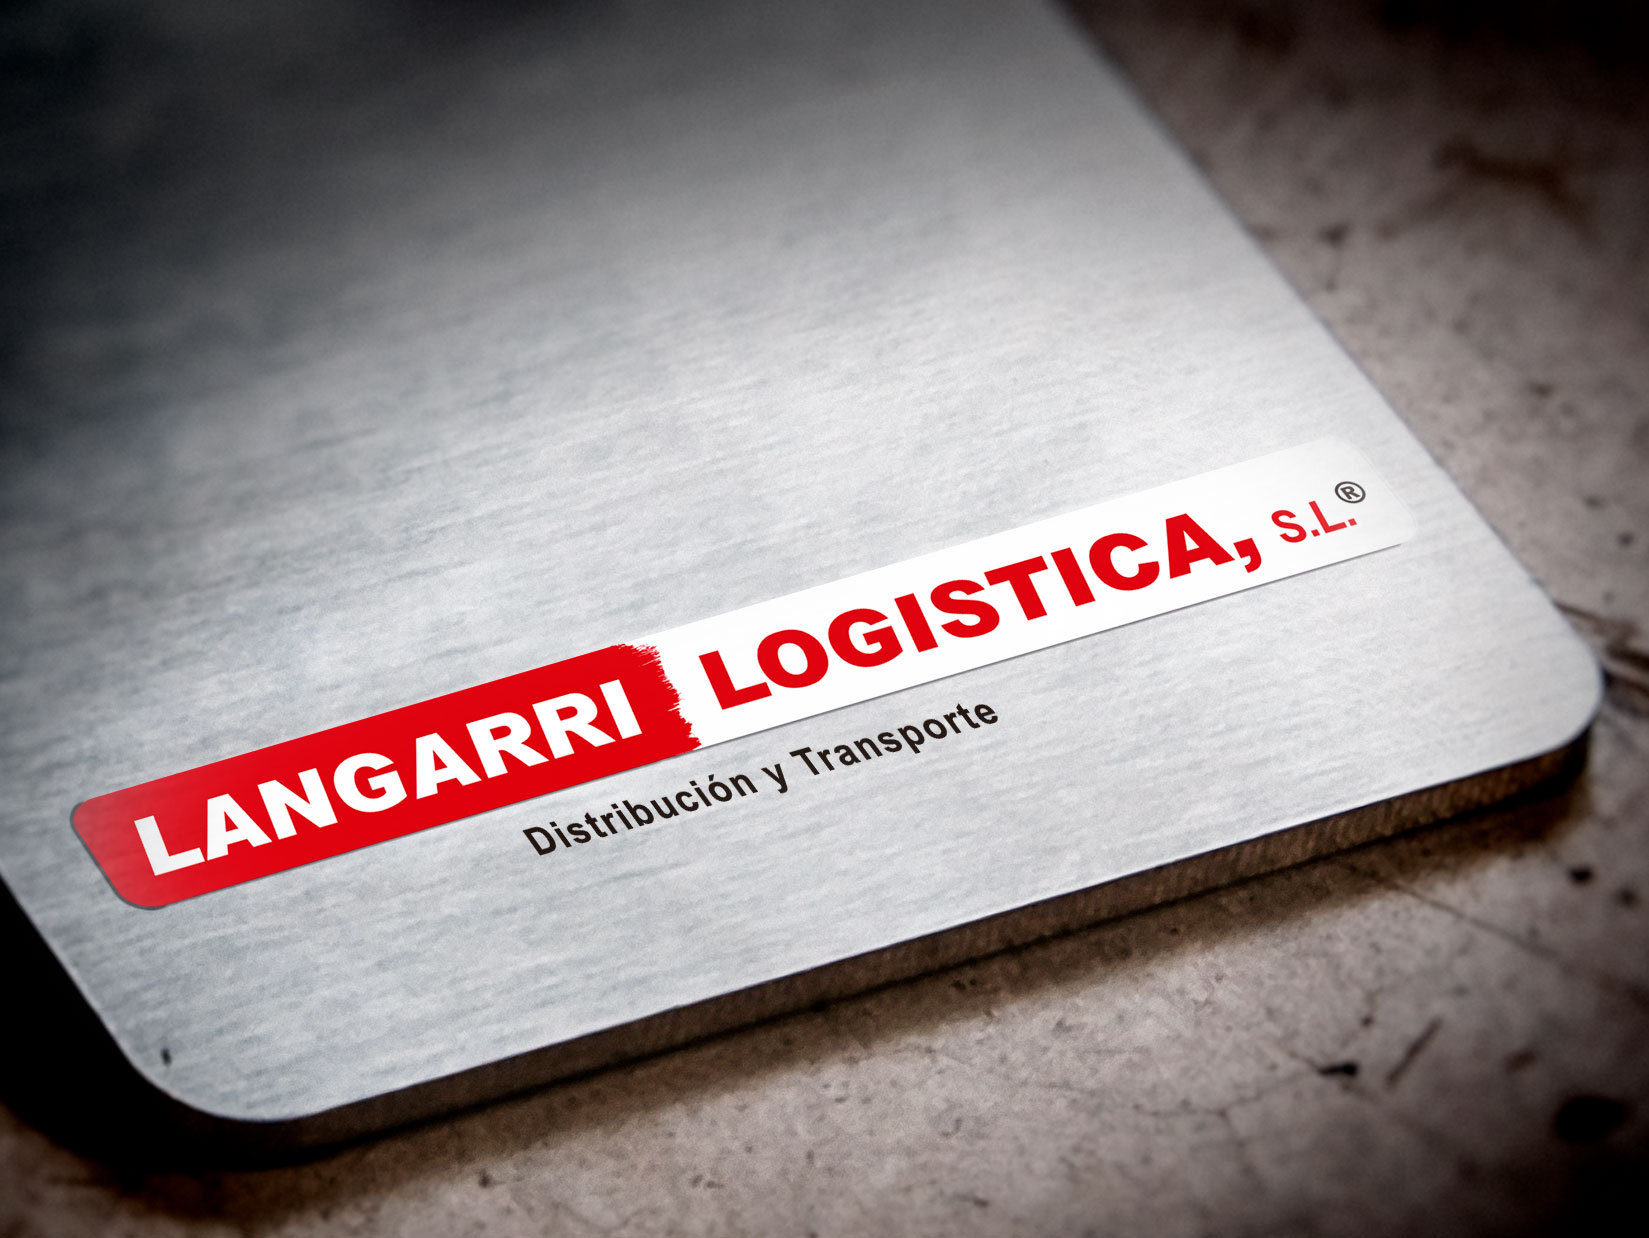 Logo: restyling del logo para Langarri Logística.Diseño Gráfico e Impresión: tarjetas, papelería de empresa.